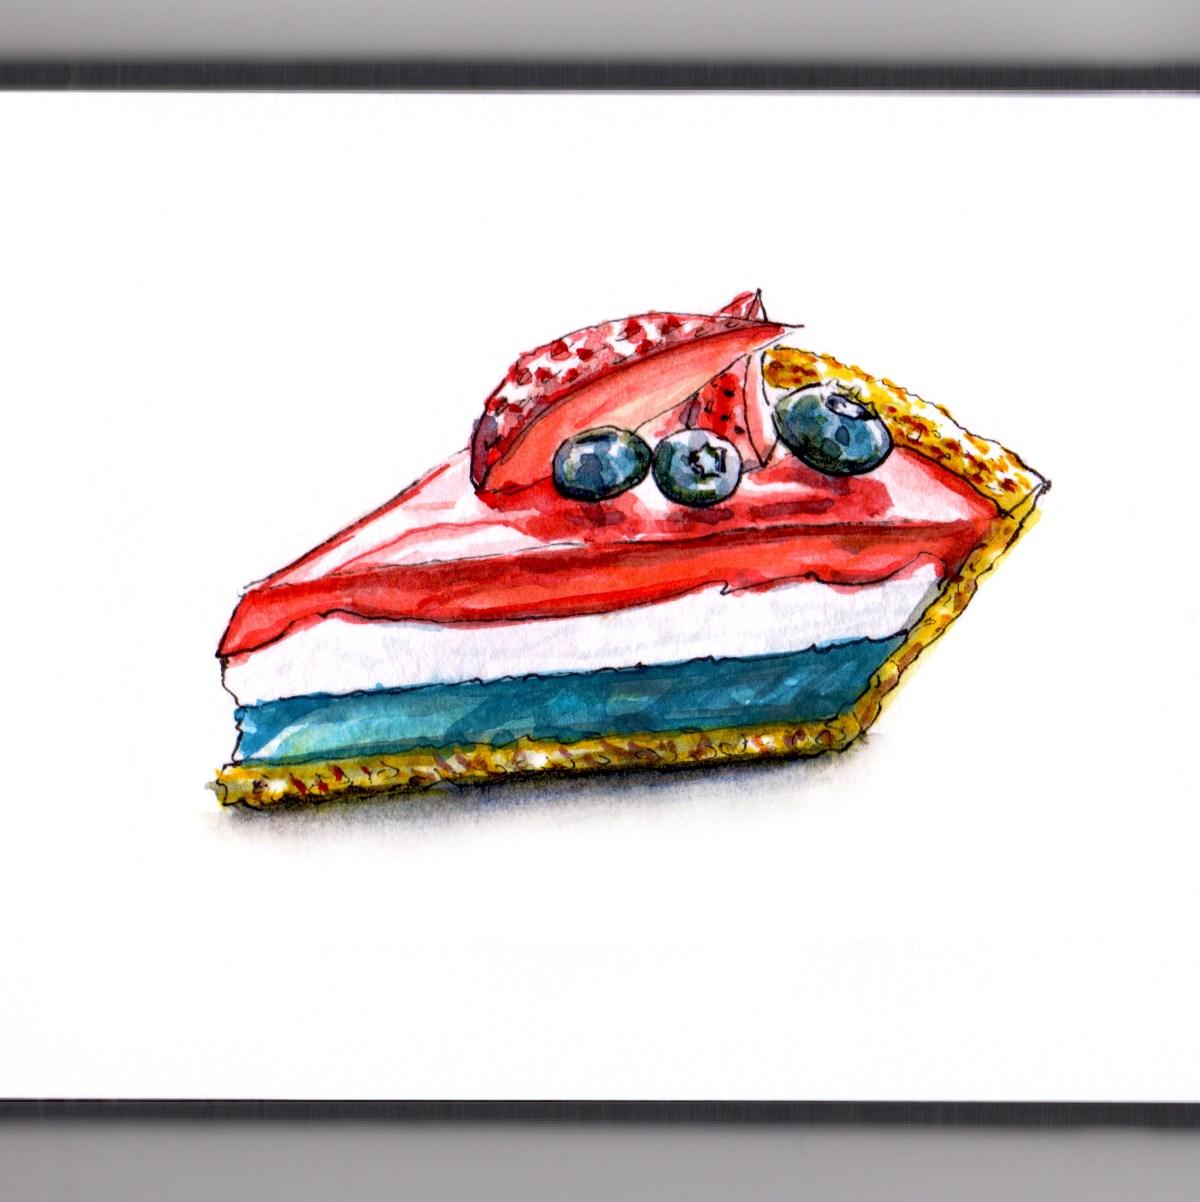 Day 29 - #WorldWatercolorGroup - American Pie Watercolor Memorial Day - #doodlewash